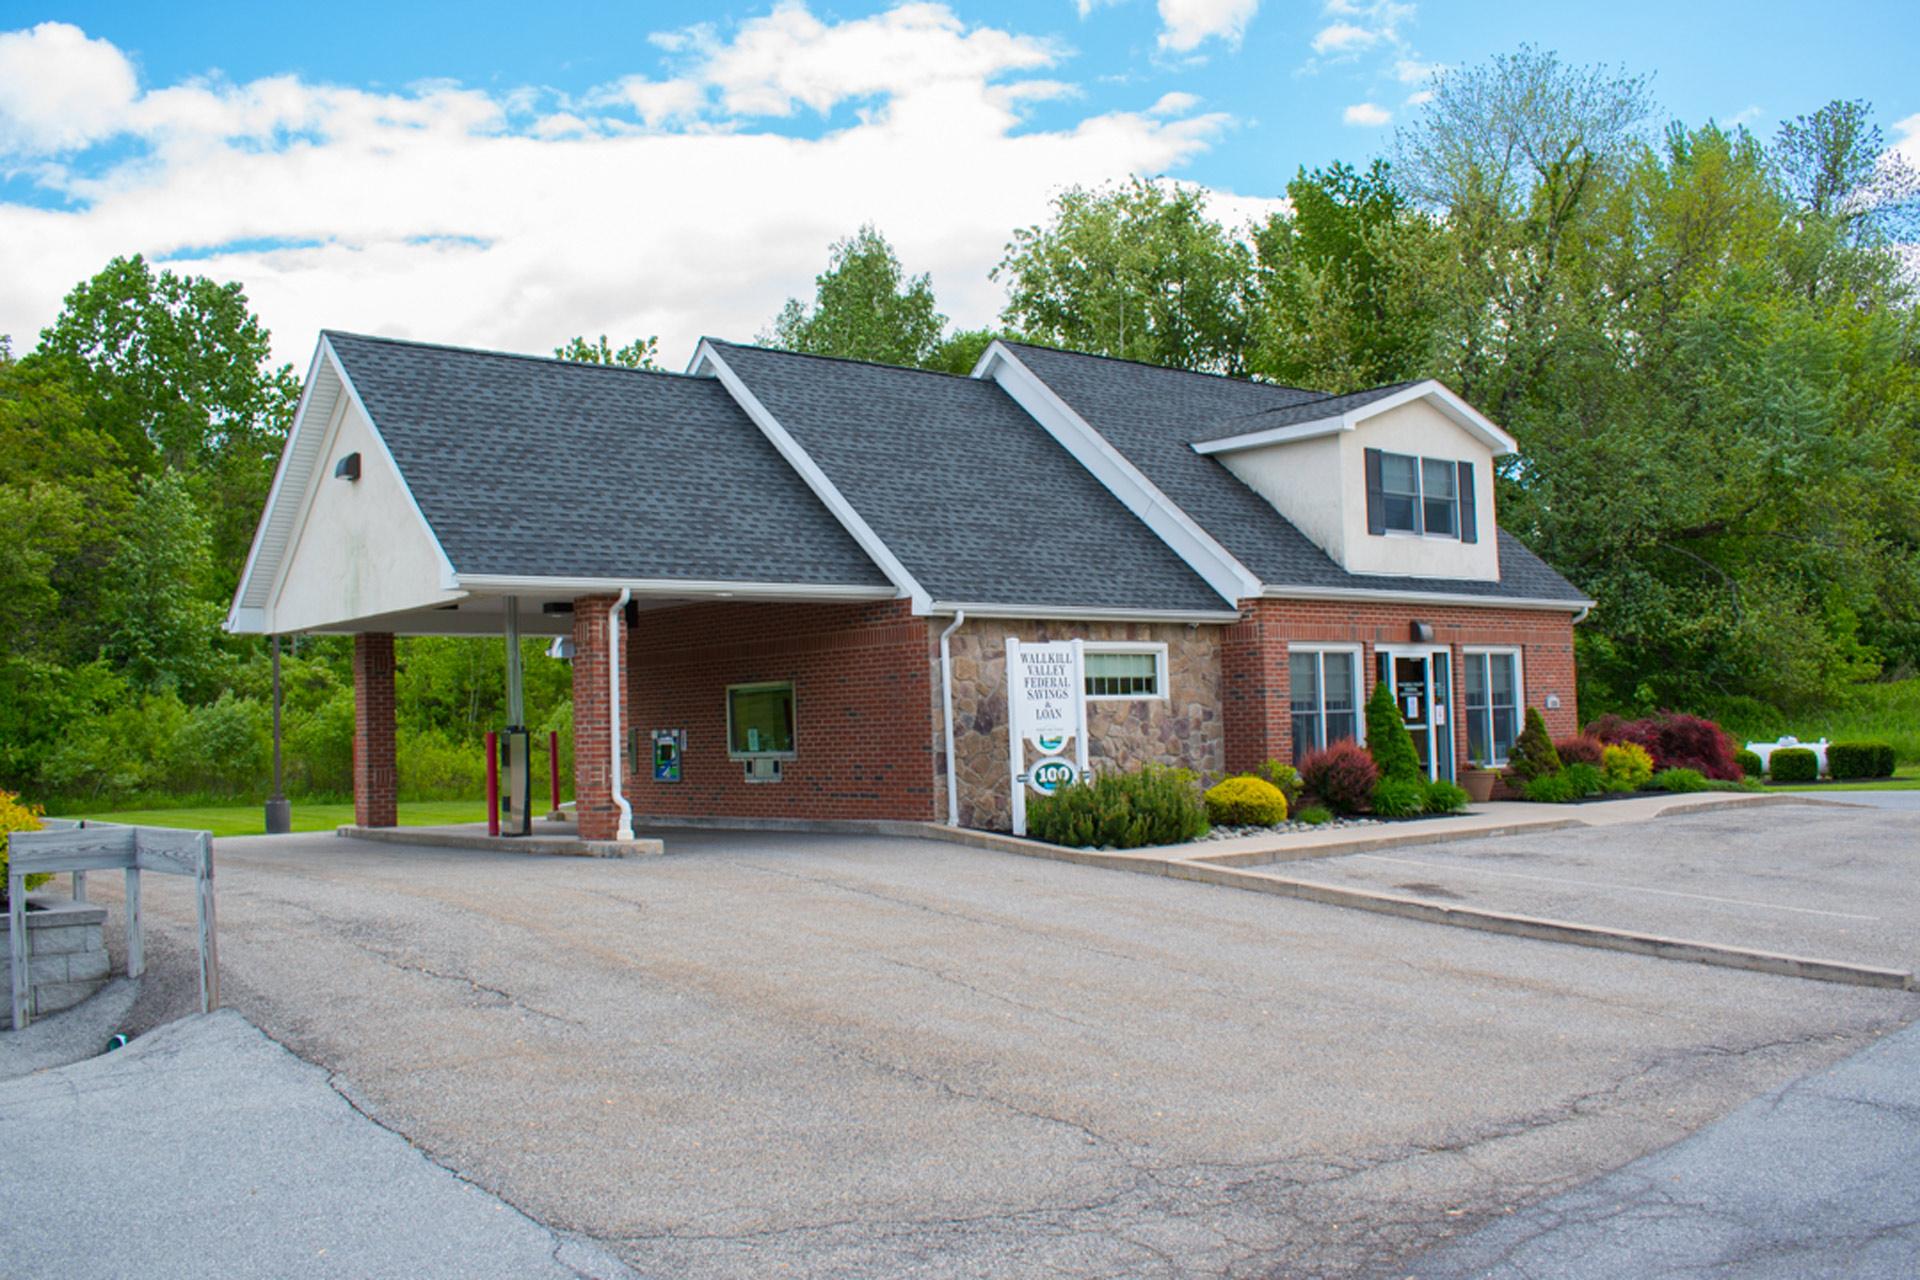 Wallkill Valley Federal Savings & Loan